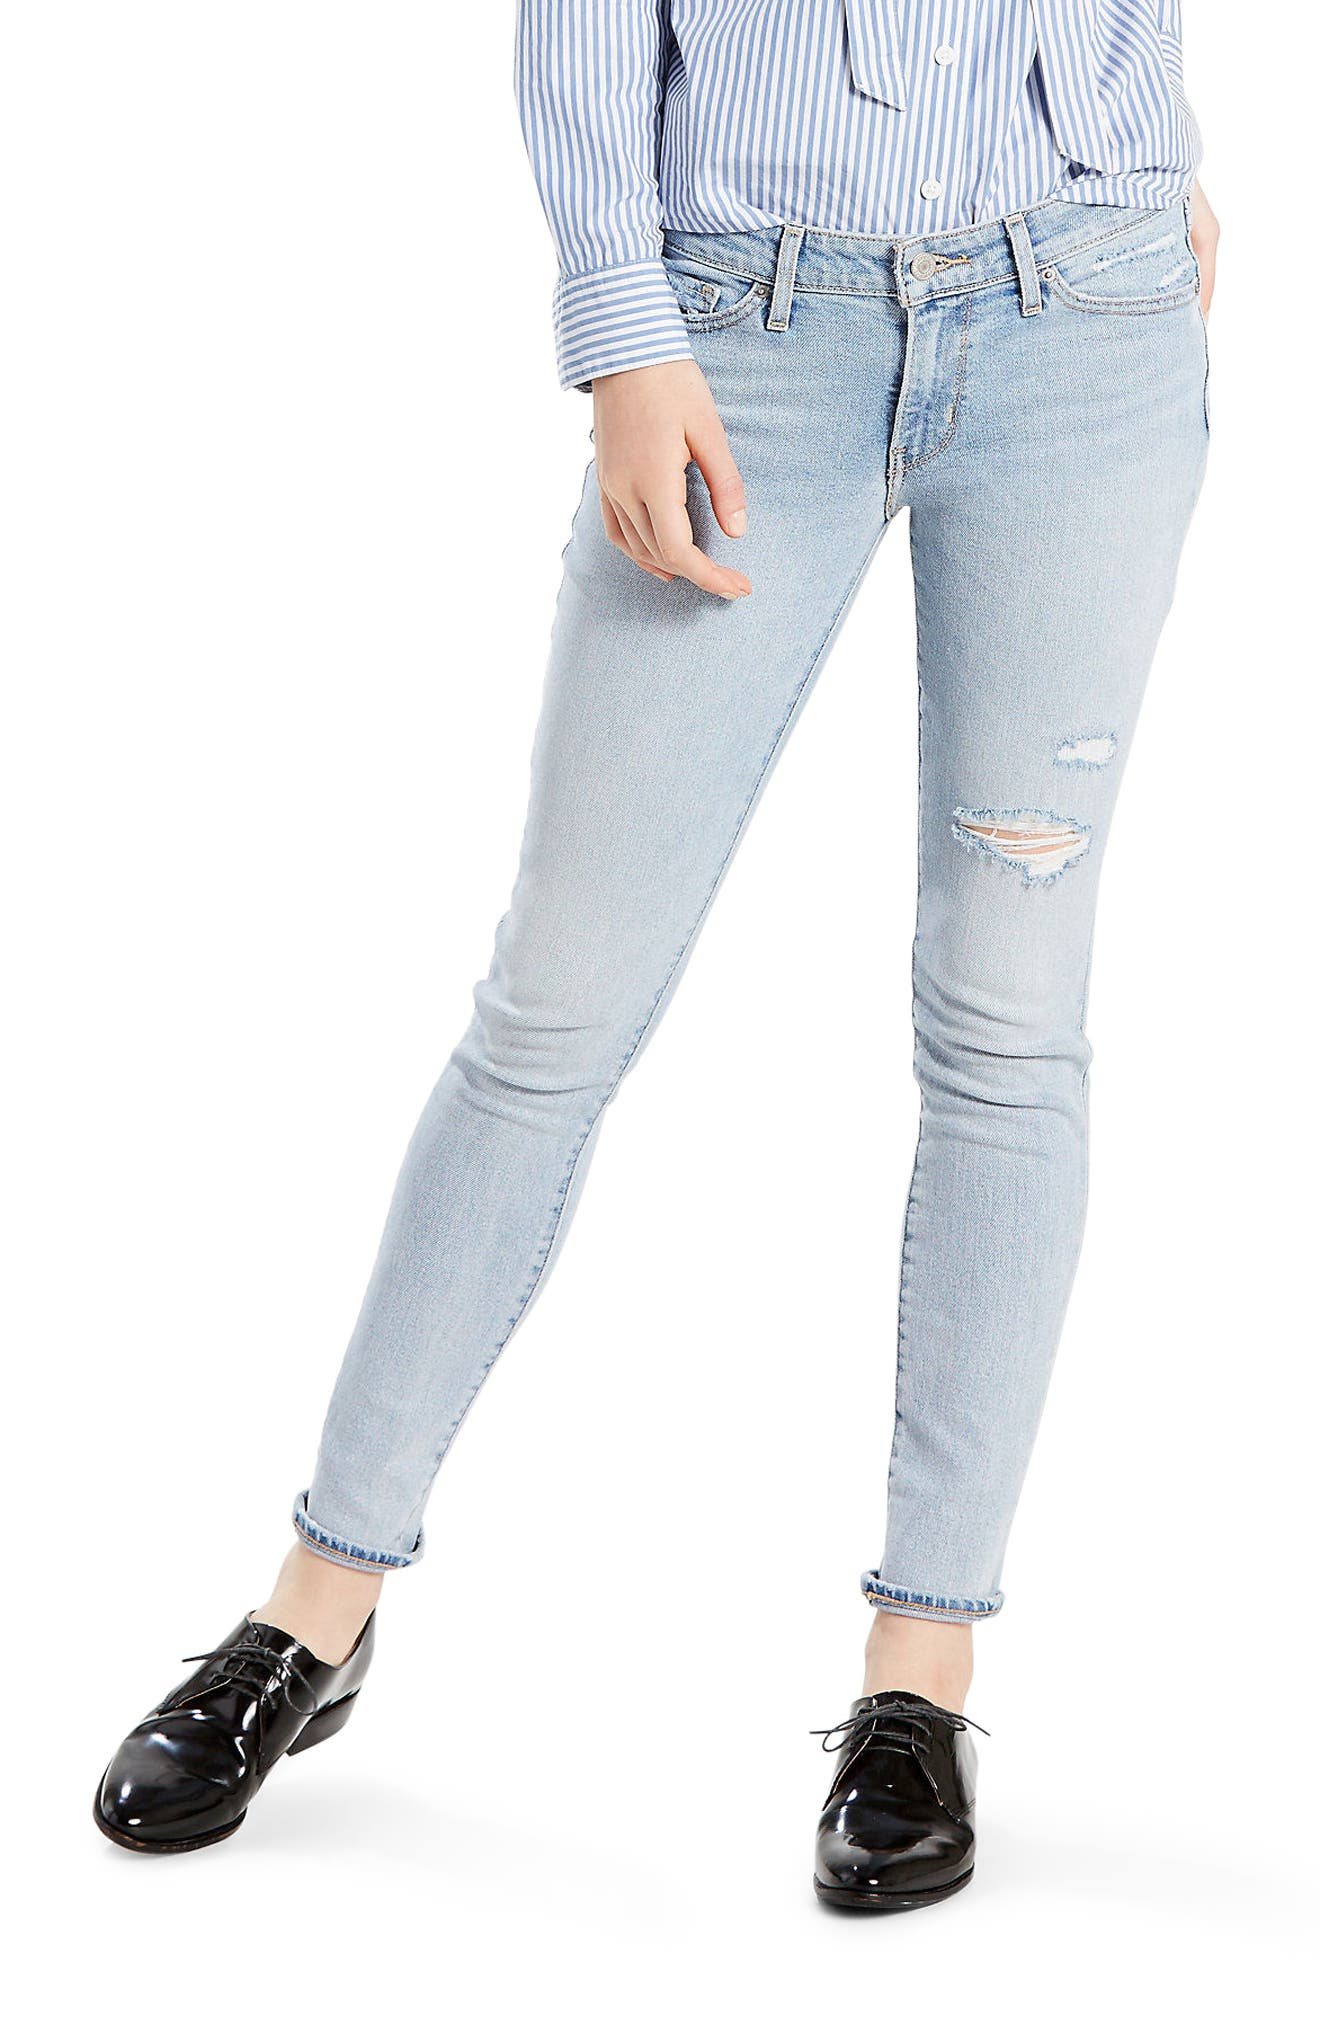 Alternate Image 1 Selected - Levi's® 711 Skinny Jeans (Let's Run Away)